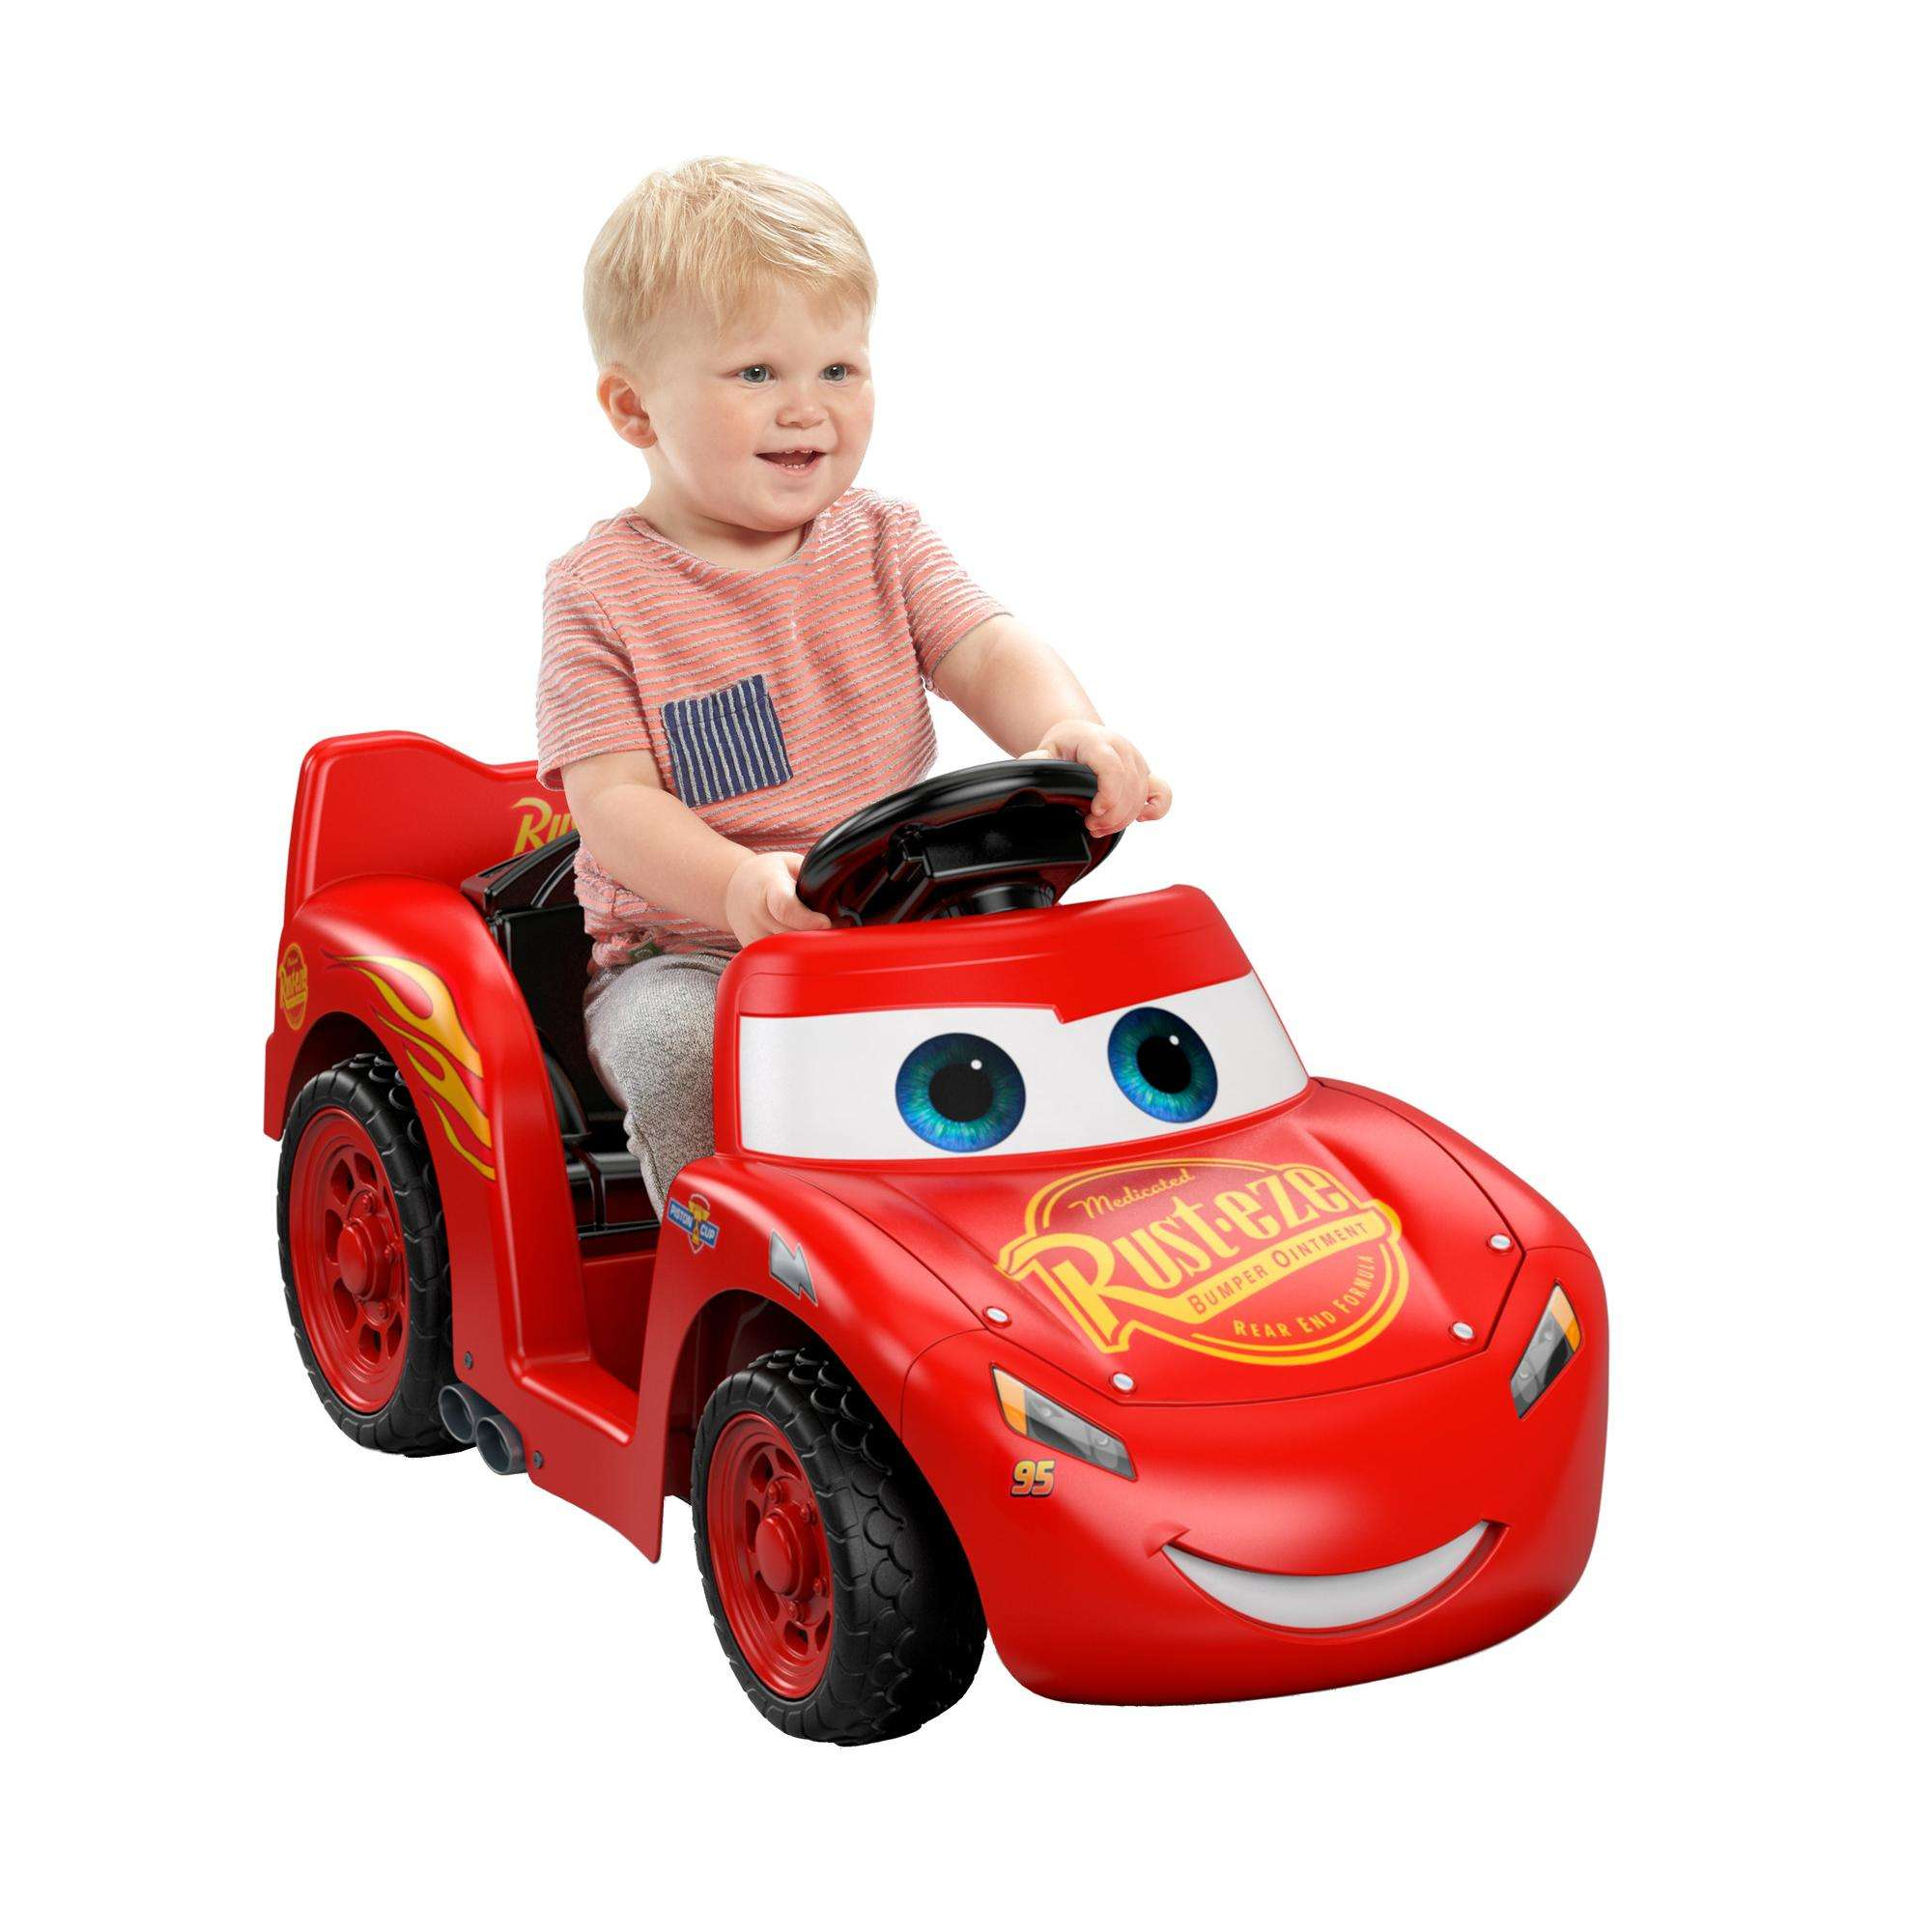 Power Wheels Disney Pixar Cars 3 Lil' Lightning McQueen by FISHER PRICE